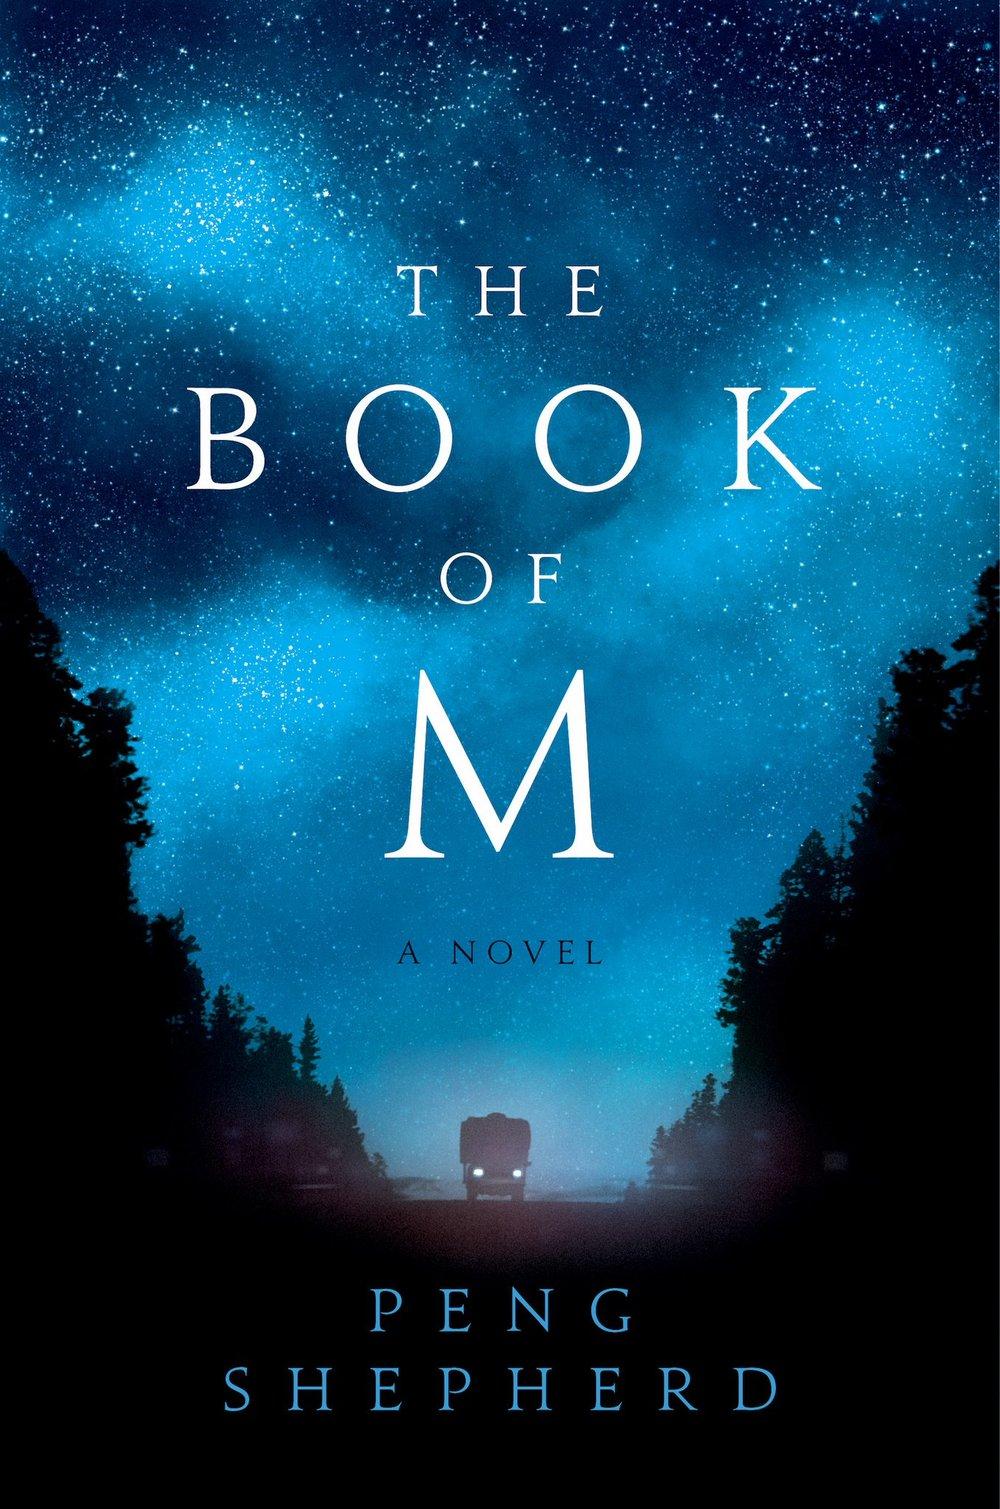 the-book-of-m-peng-shepherd.jpeg